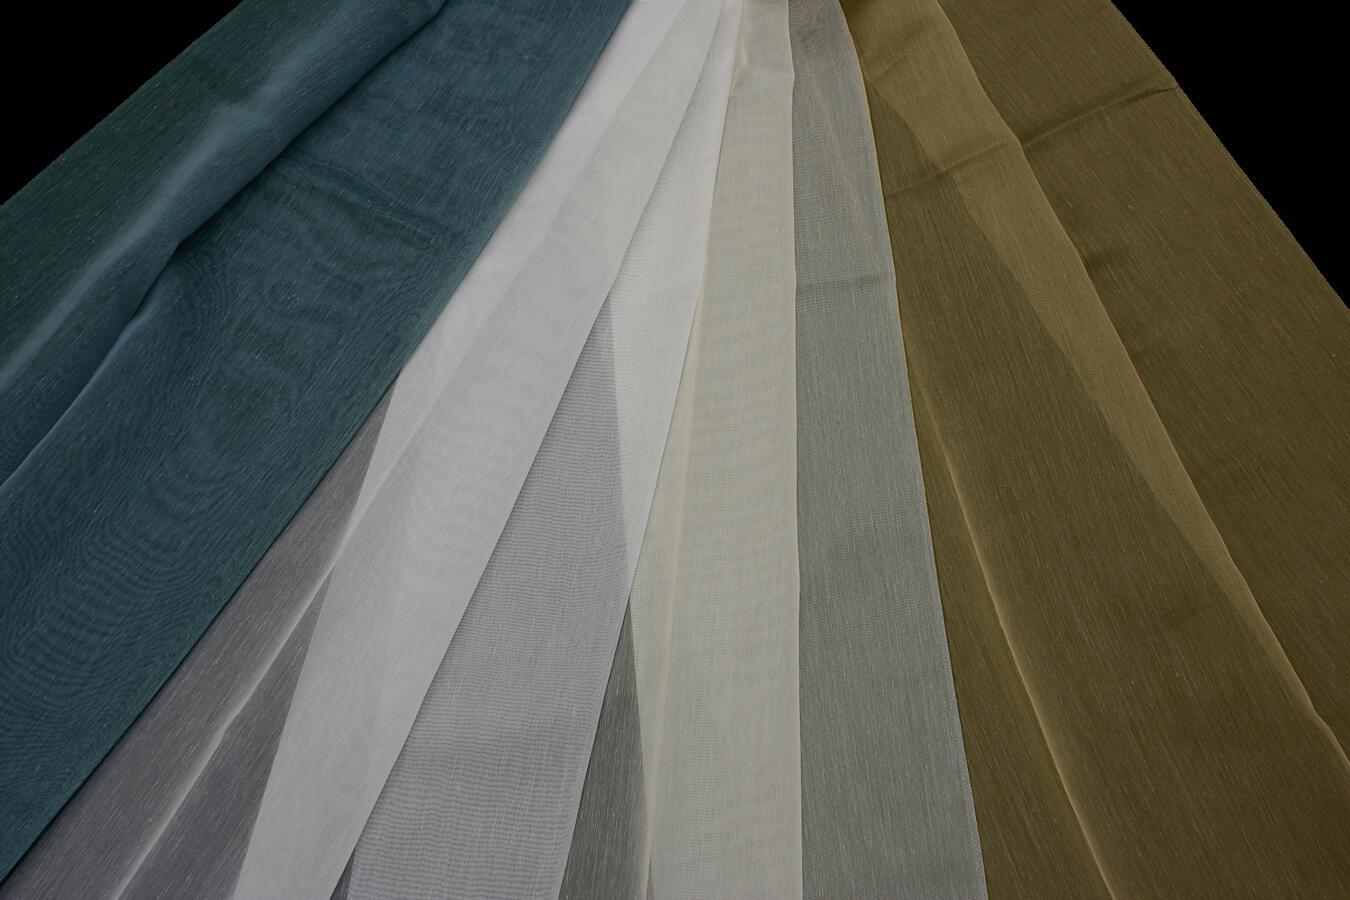 Záclona Kappa Šíře: 300 cm 50 bílá